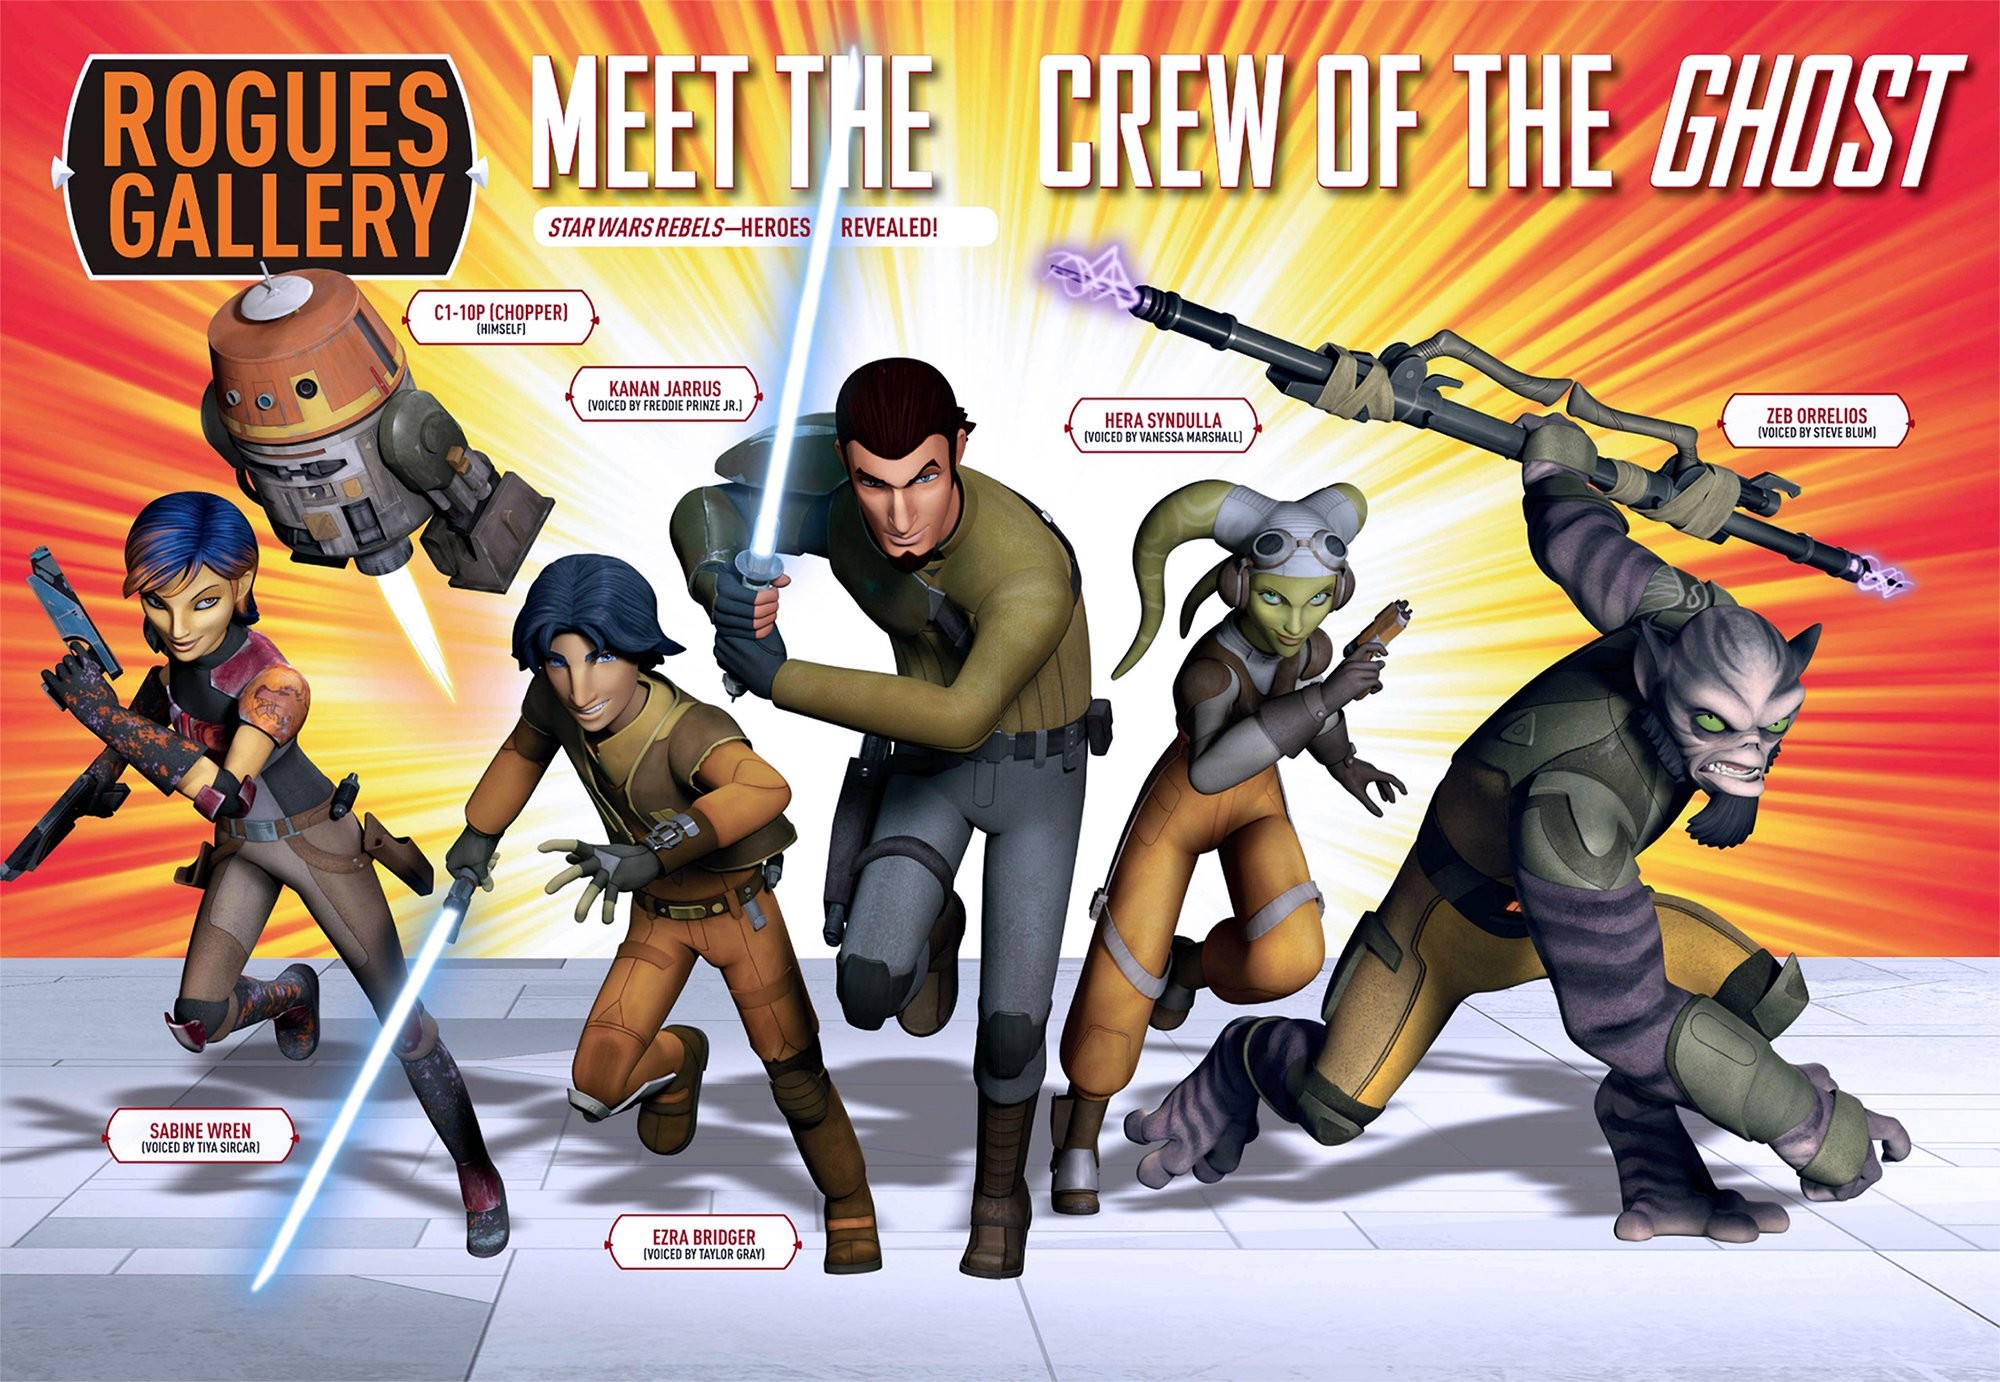 STAR WARS REBELS animated series sci-fi disney action adventure wallpaper |  | 533717 | WallpaperUP